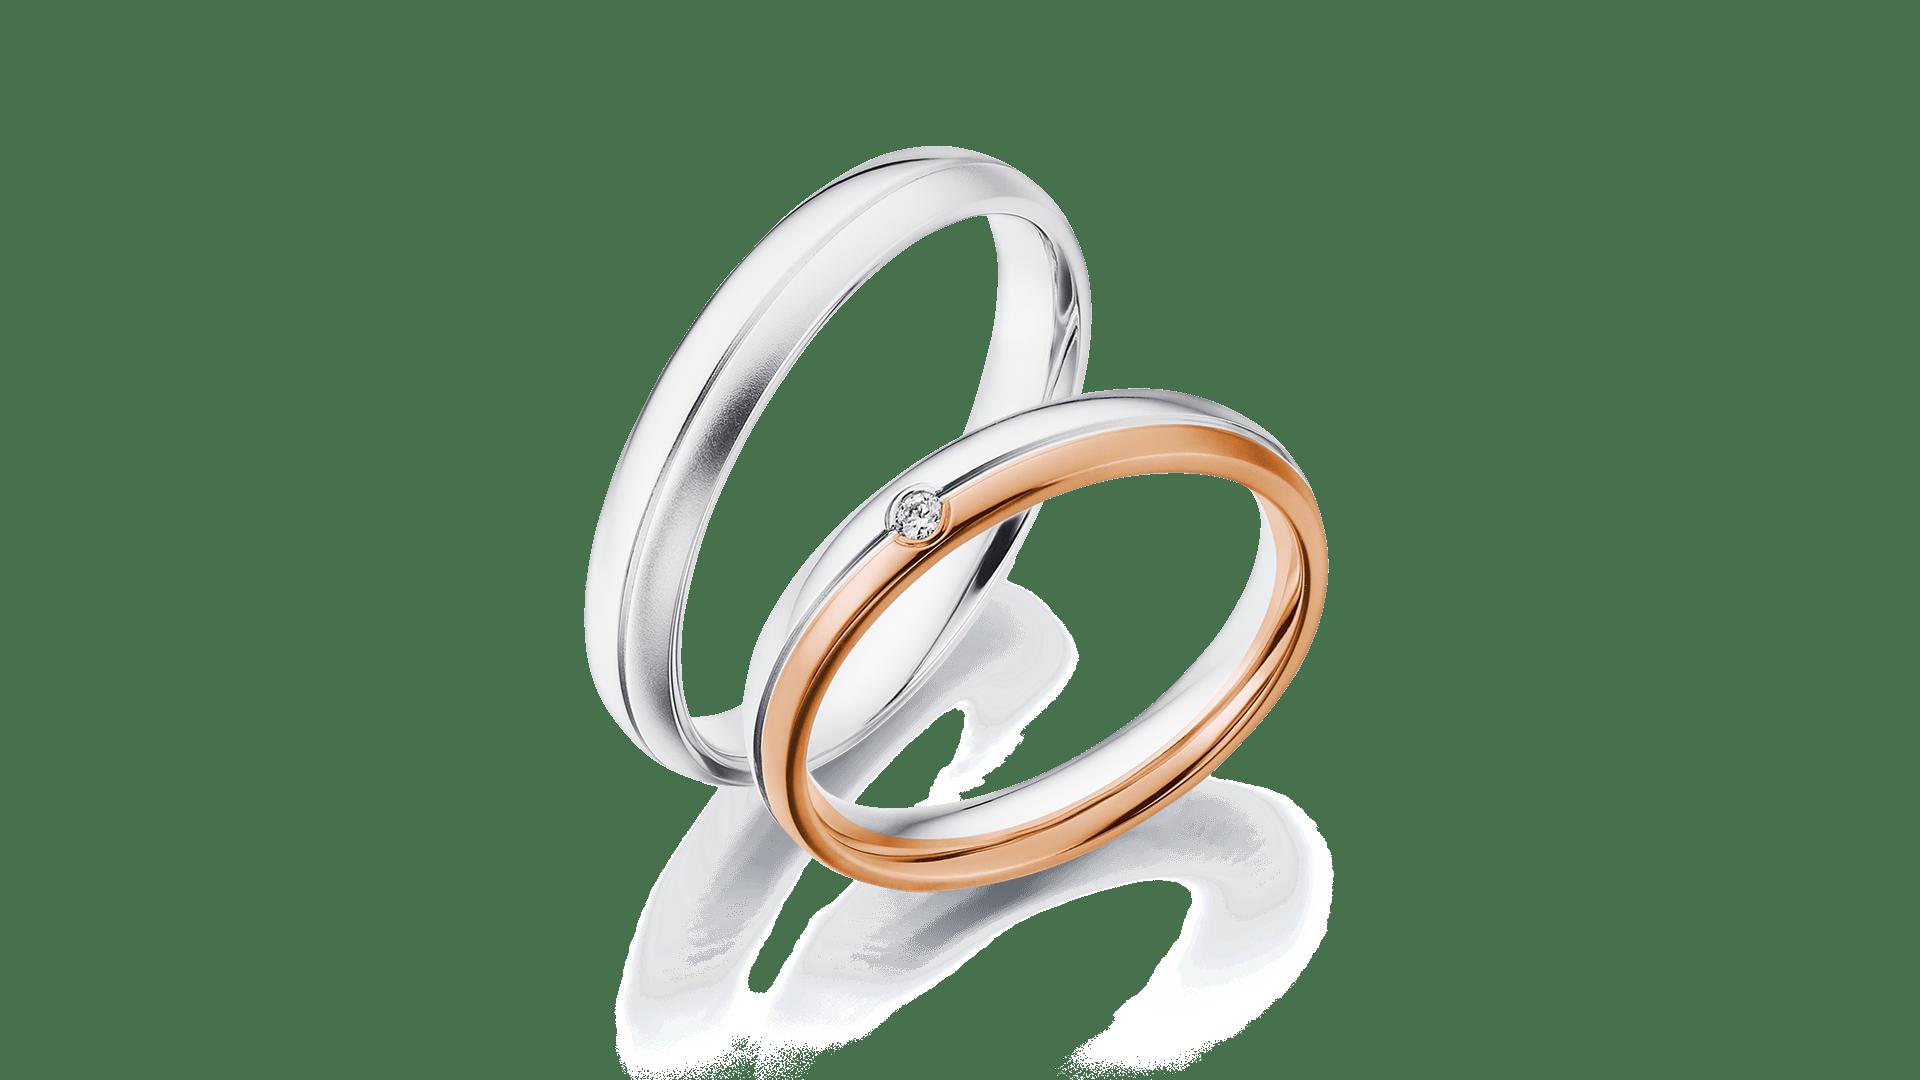 phaetone パエトーネ   結婚指輪サムネイル 2